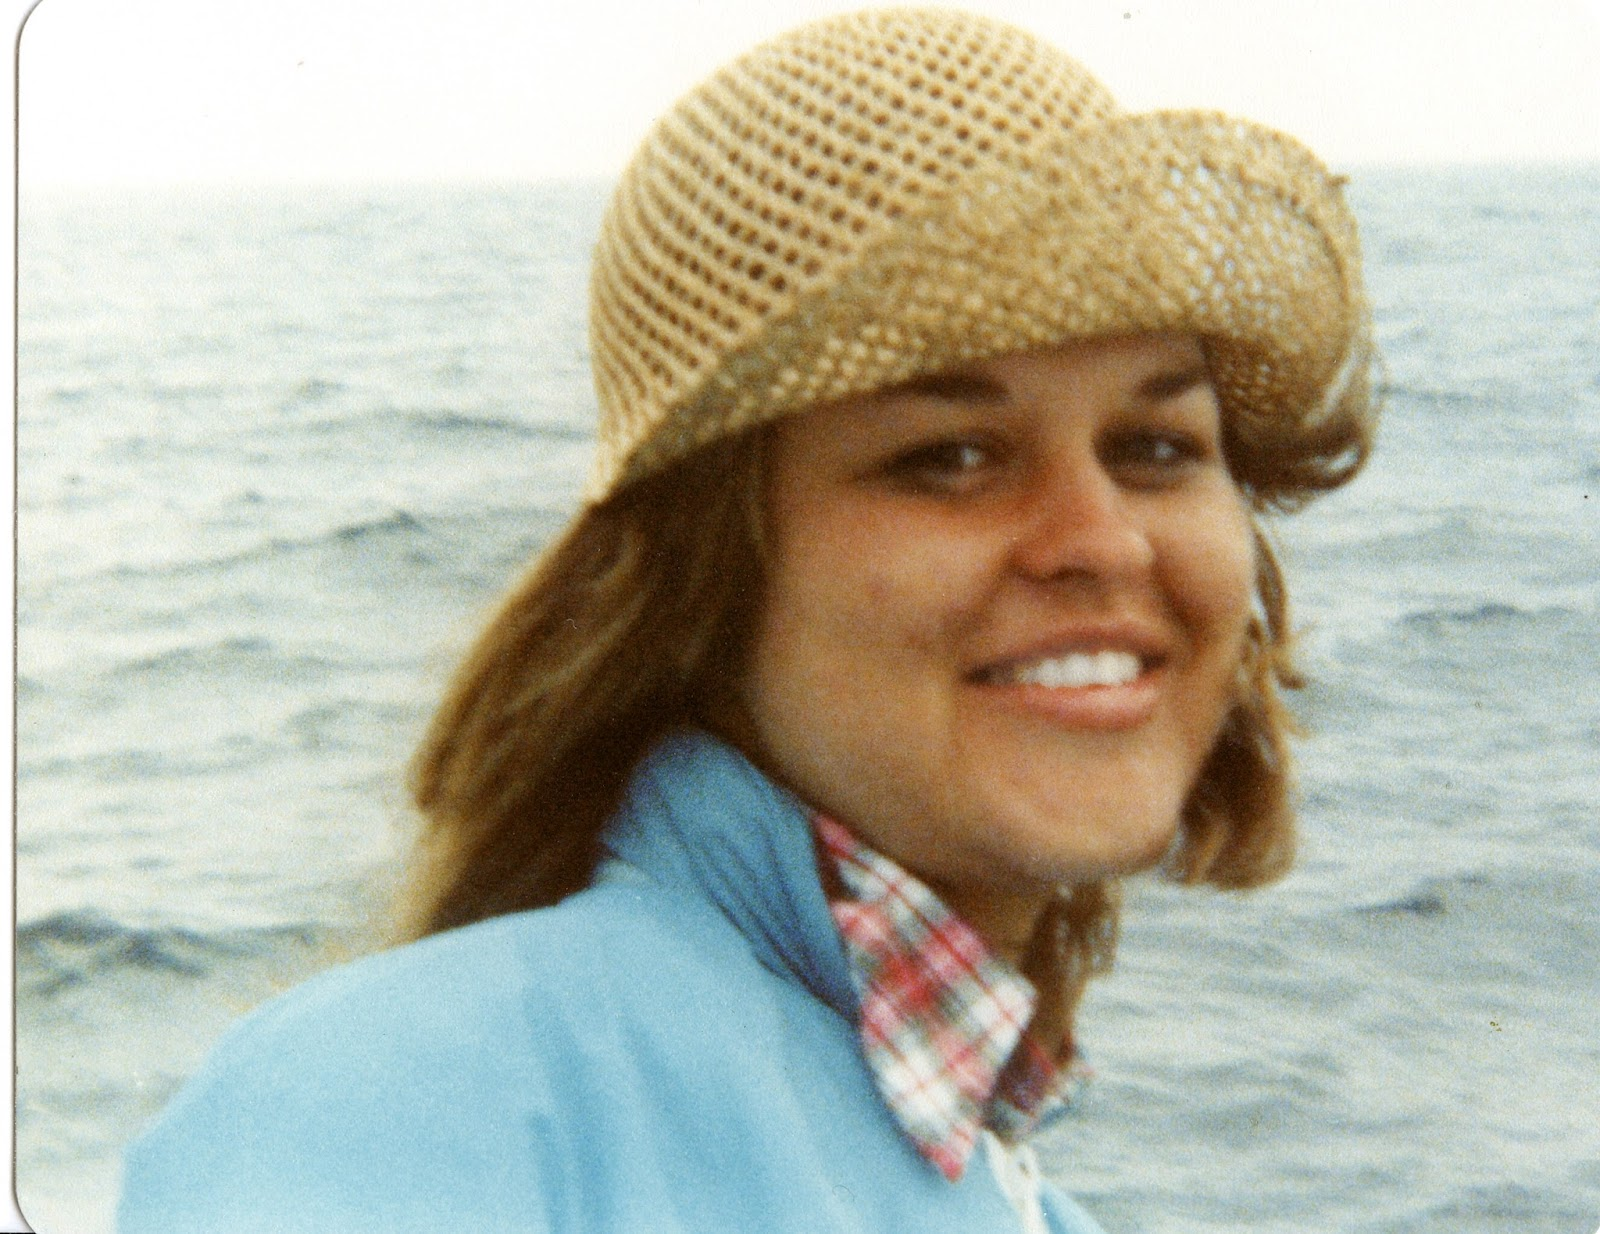 Sherri Rae Rasmussen 271957 2241986 Trials